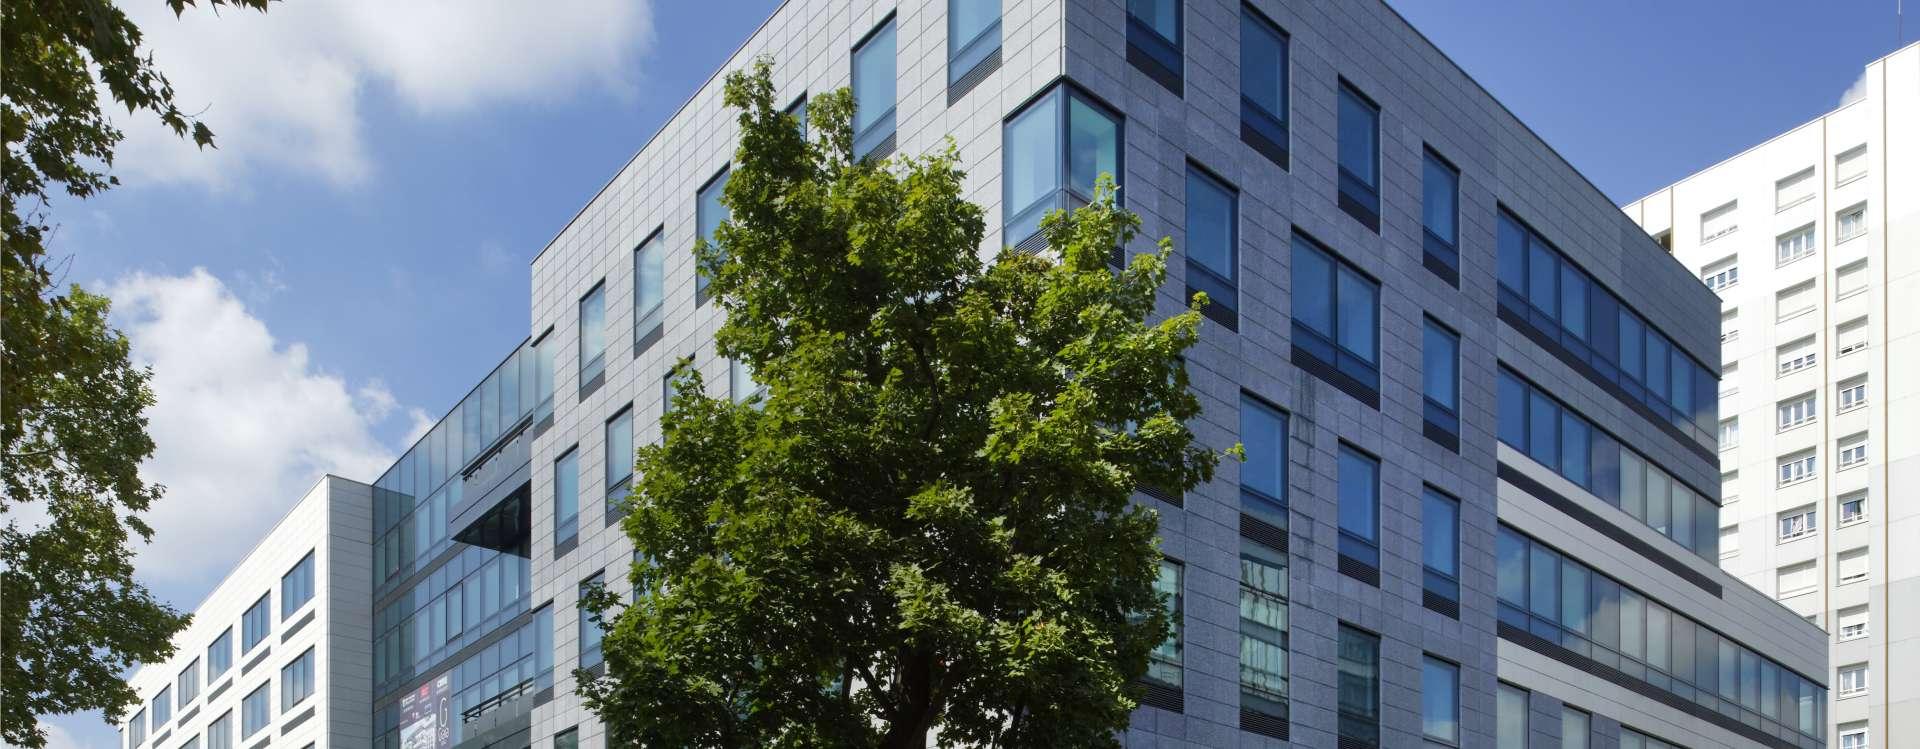 Gaïa in Nanterre, an 11,000 m² office building, including 4,000 m² under marketing